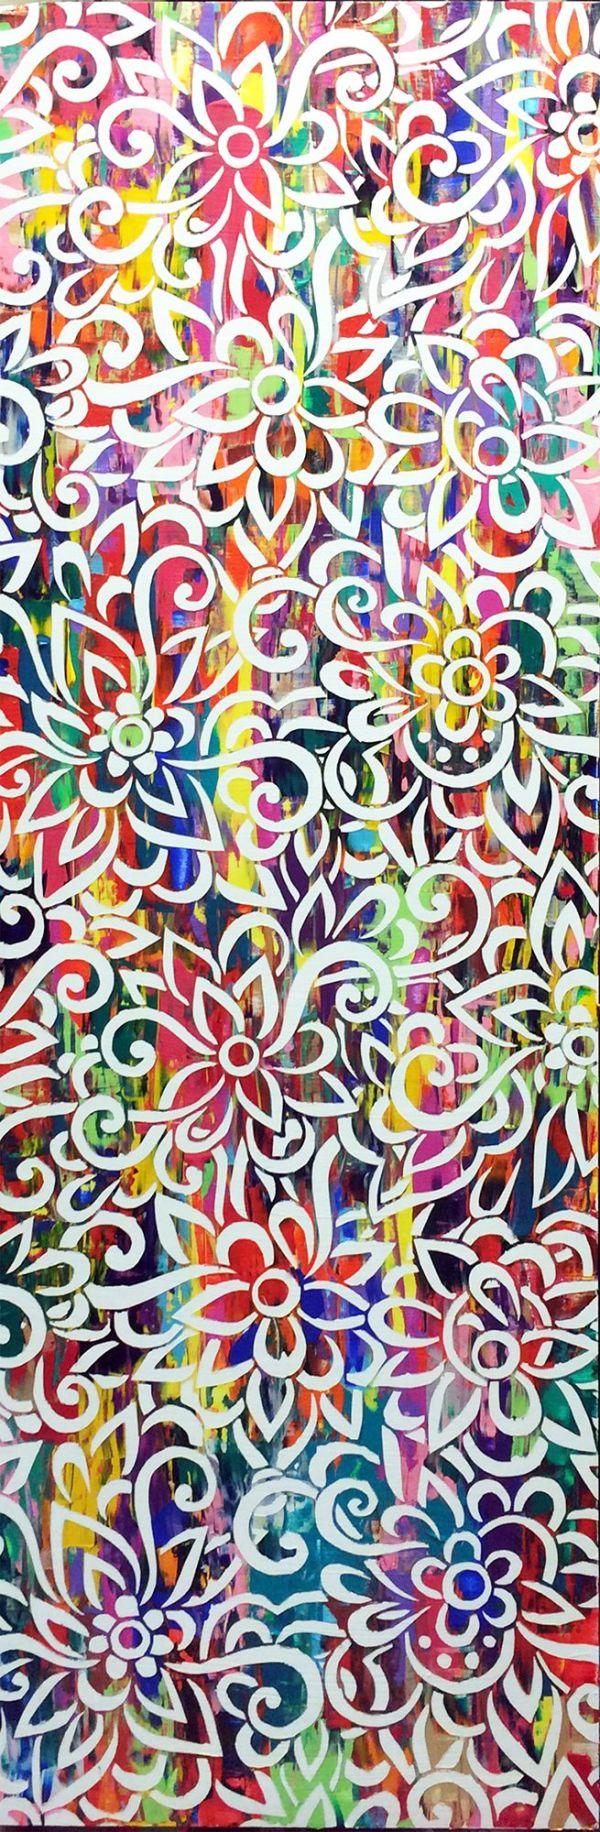 Flora by Sean Christopher Ward